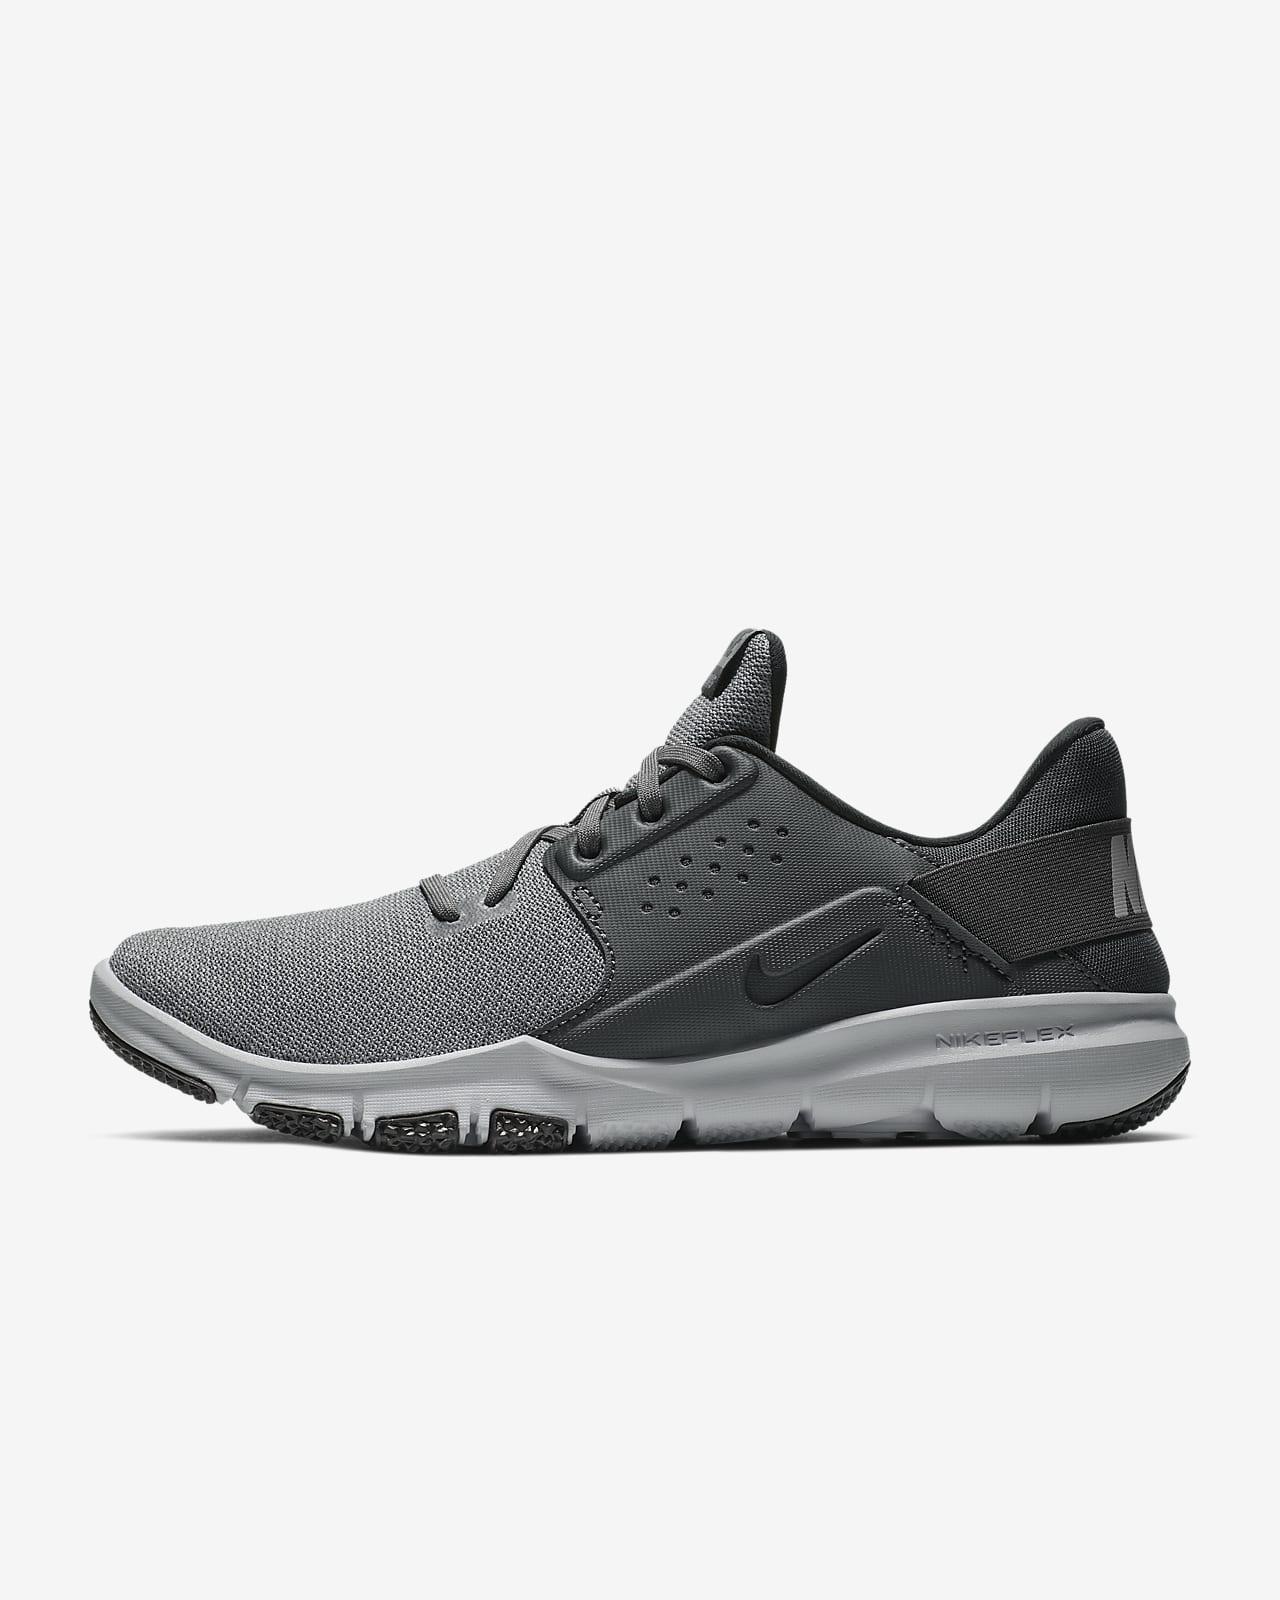 Descanso frecuencia Mal funcionamiento  Nike Flex Control 3 Men's Training Shoe. Nike.com